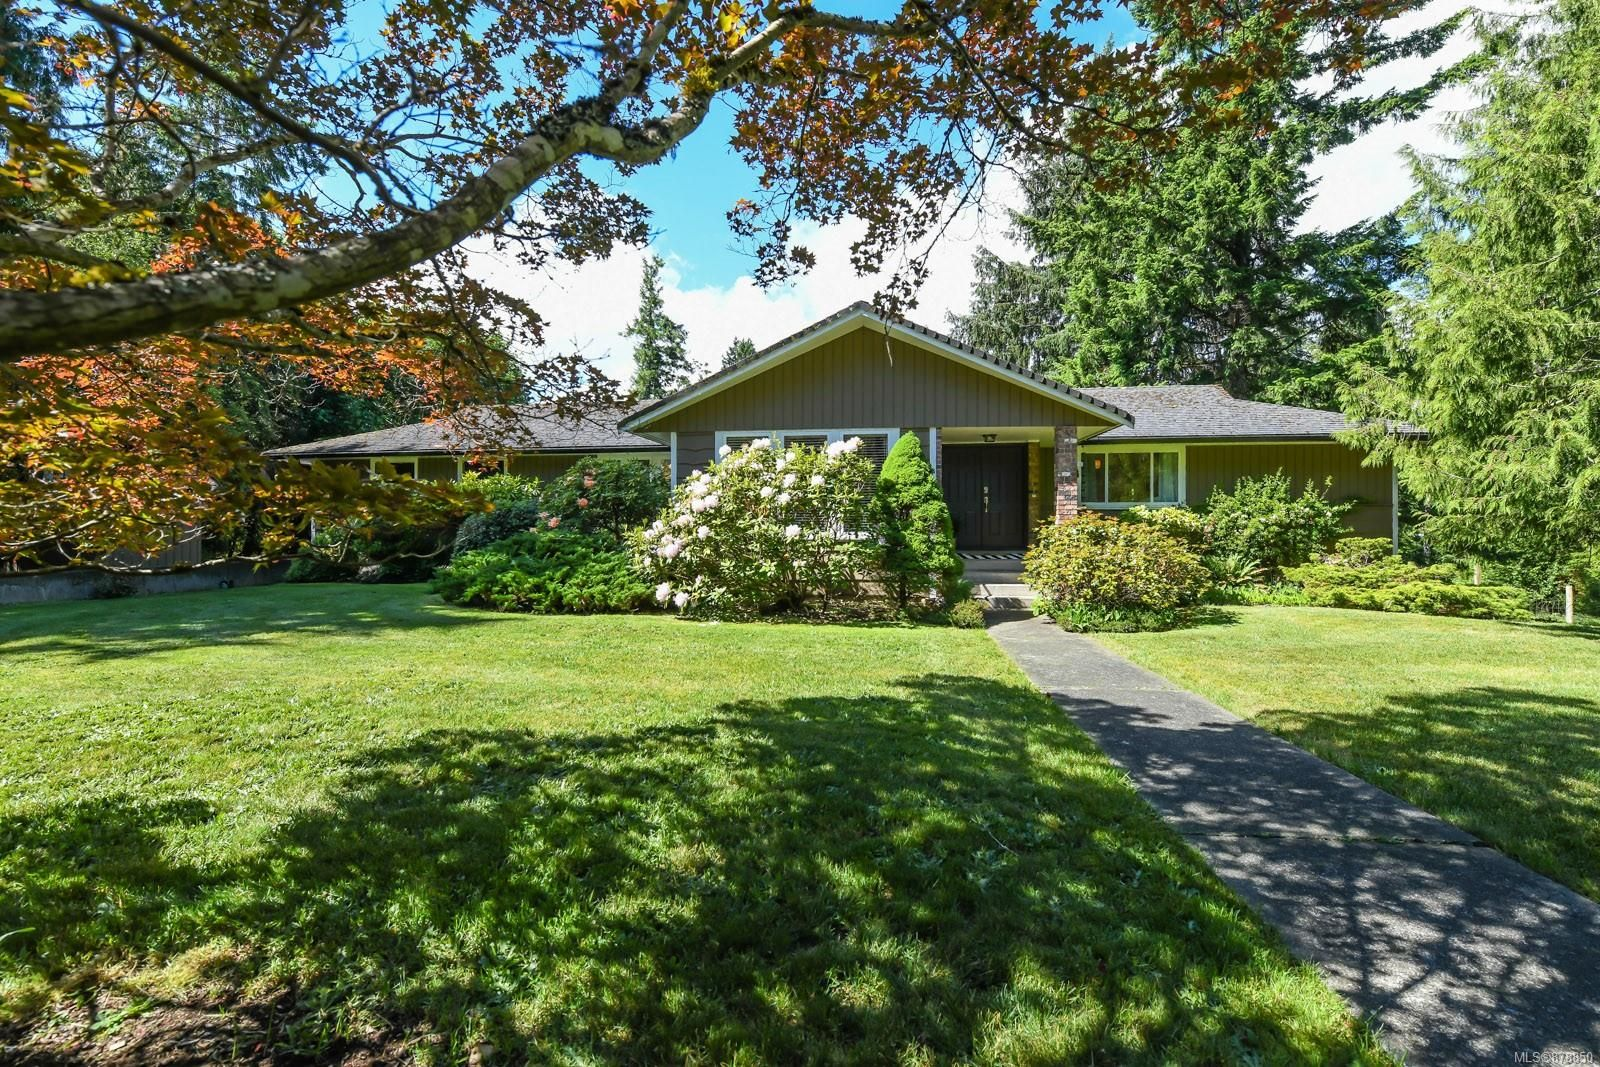 Main Photo: 4949 Willis Way in : CV Courtenay North House for sale (Comox Valley)  : MLS®# 878850